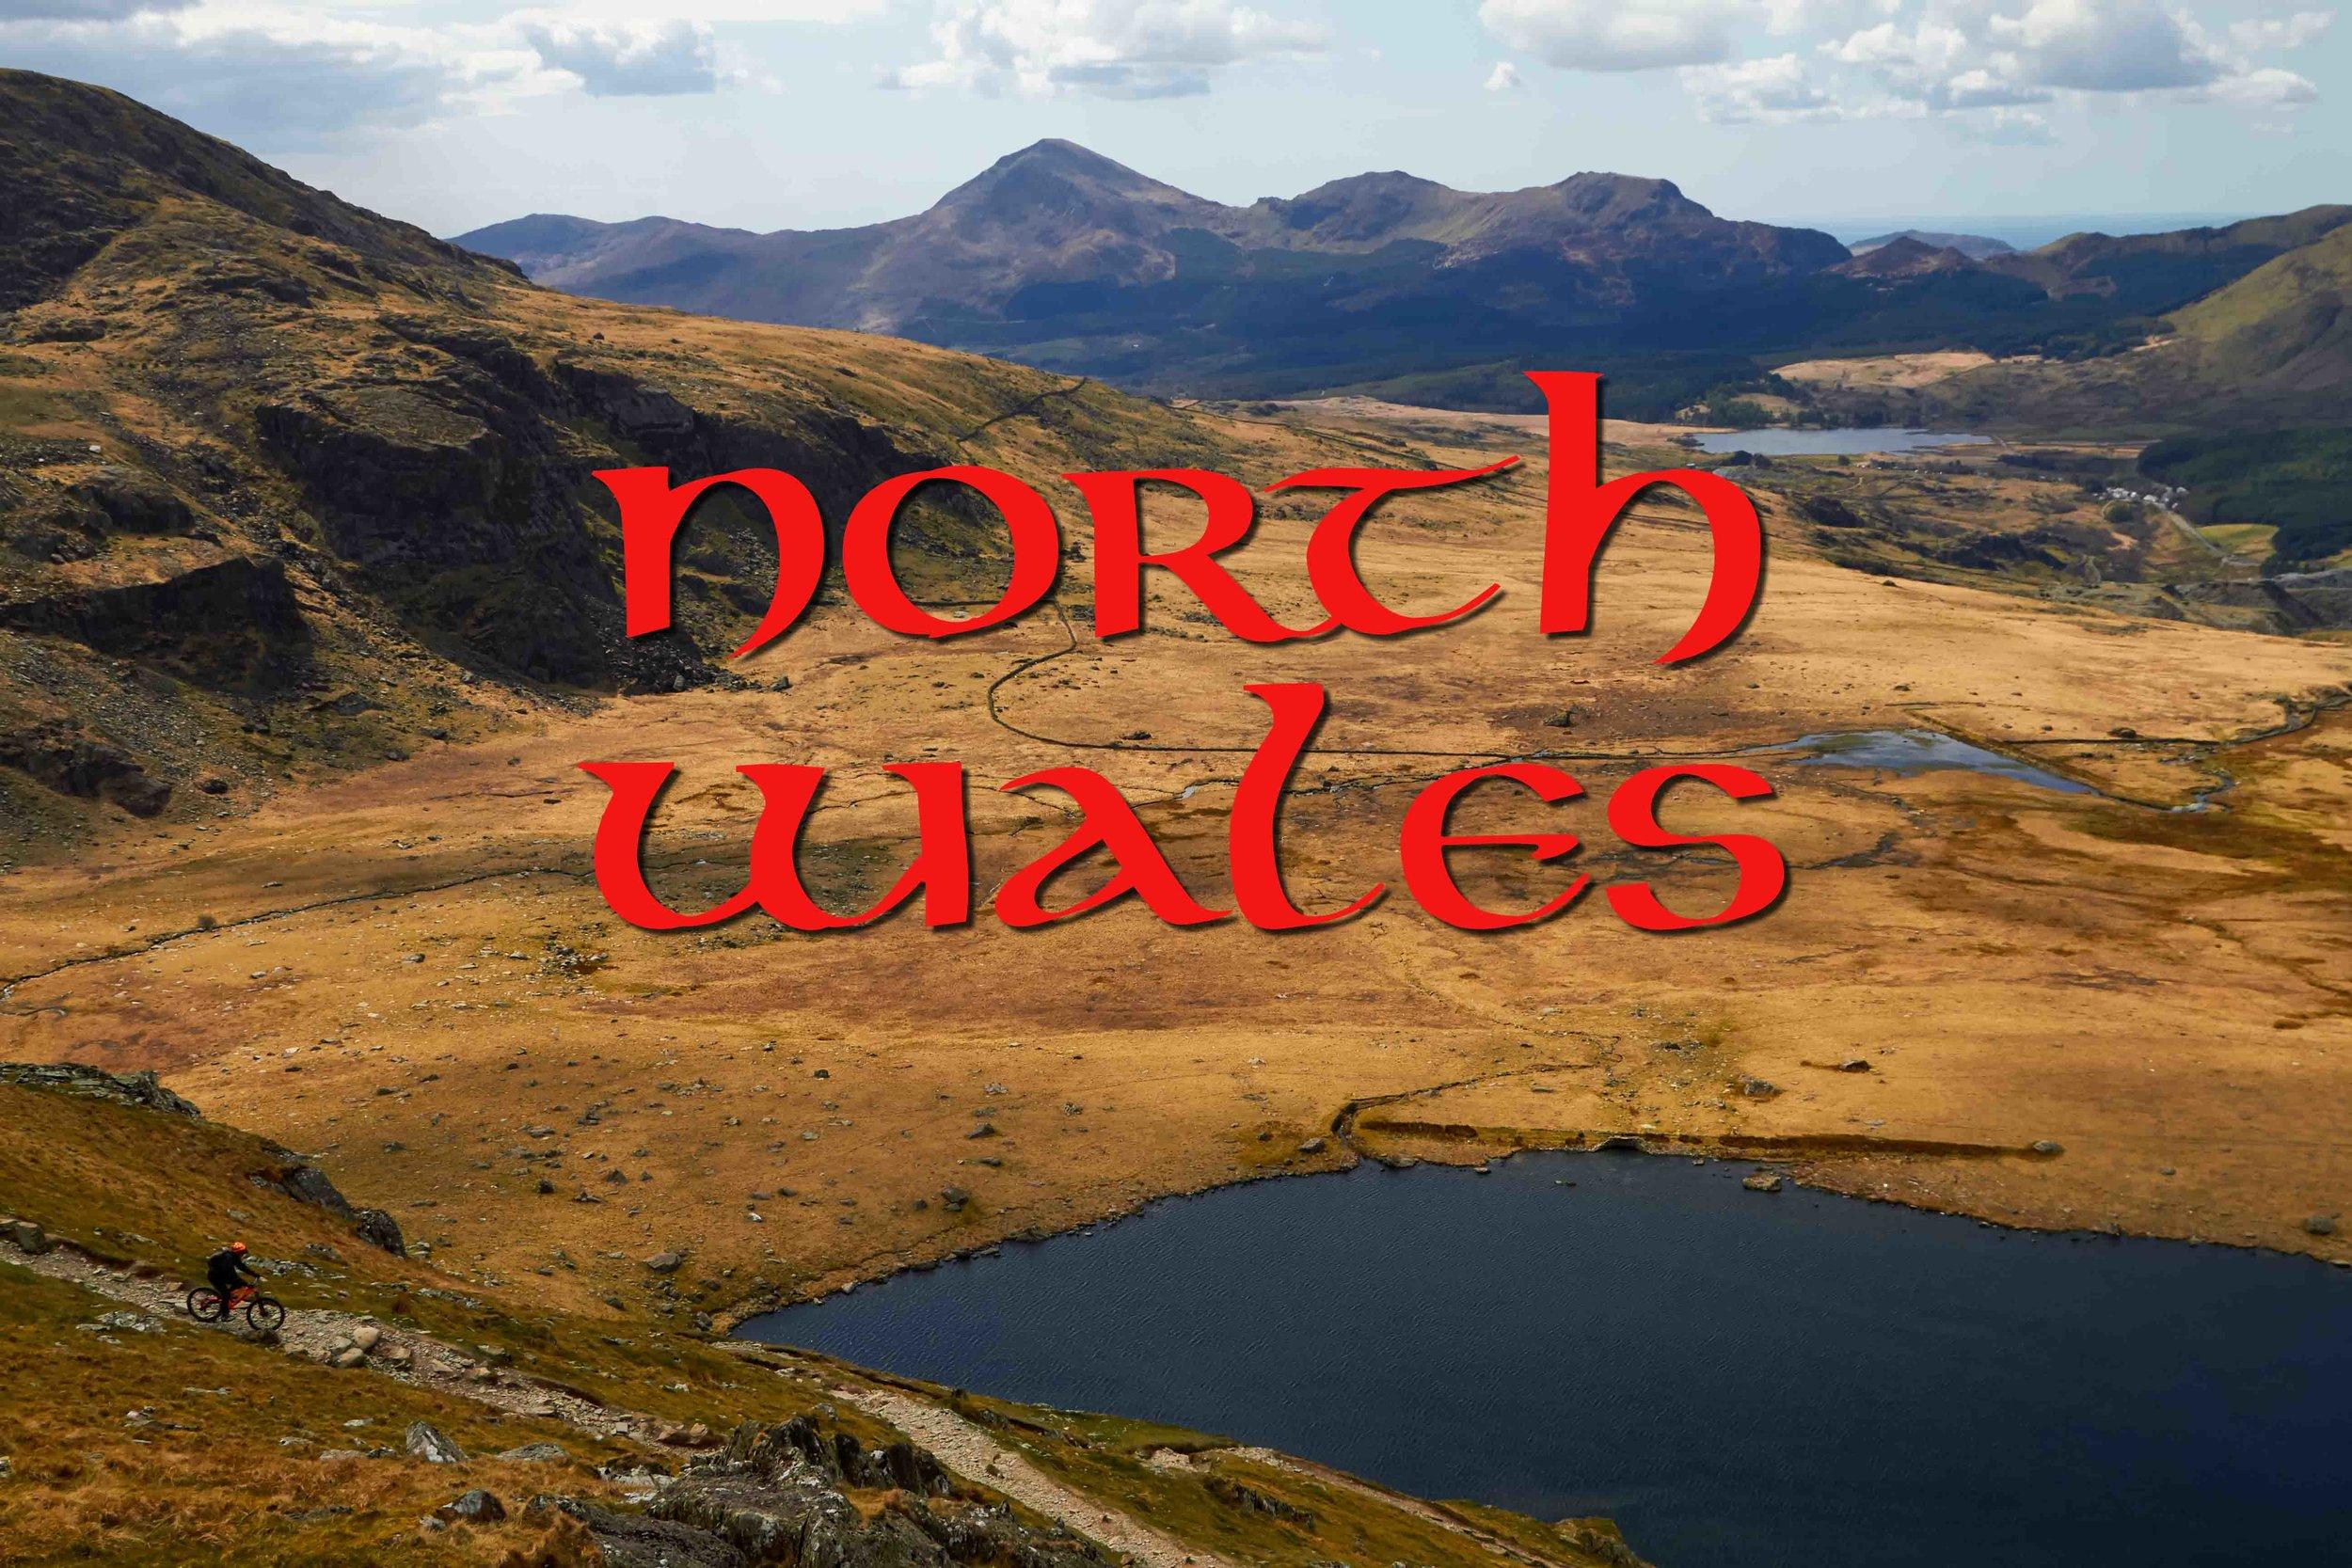 North Wales Title.jpg